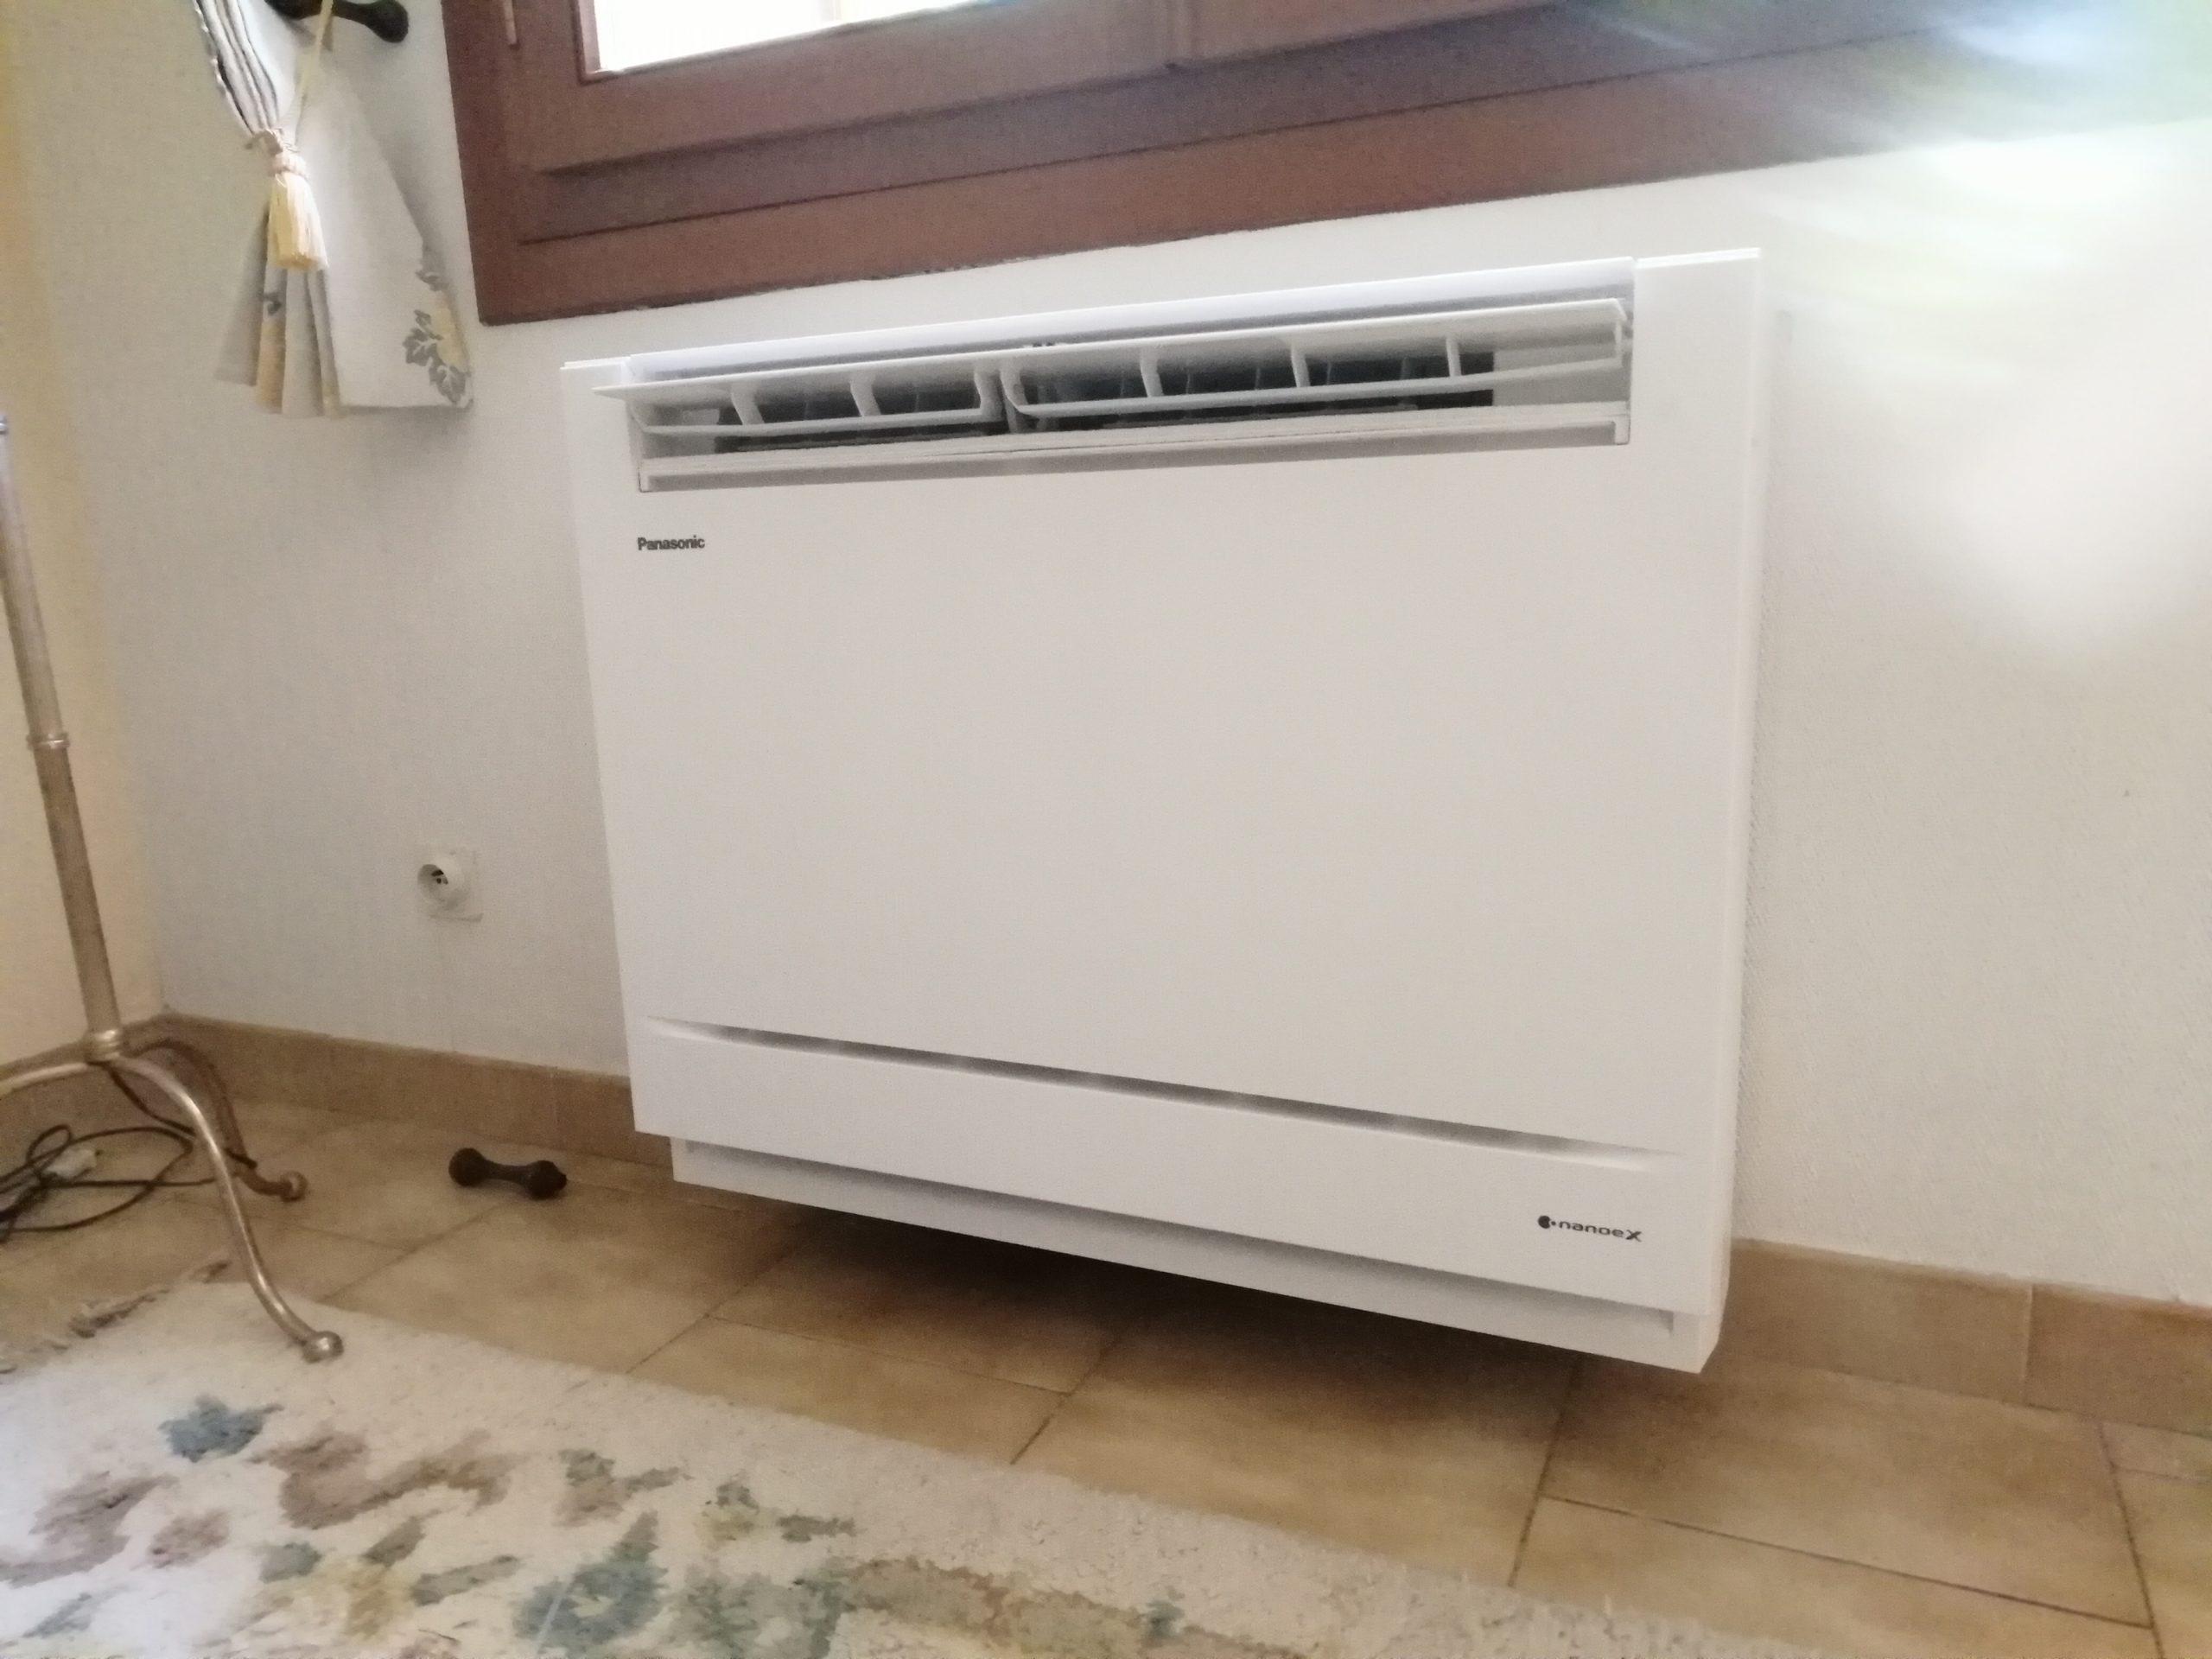 Console Murale Panasonic 5,00 kW Bras (83)